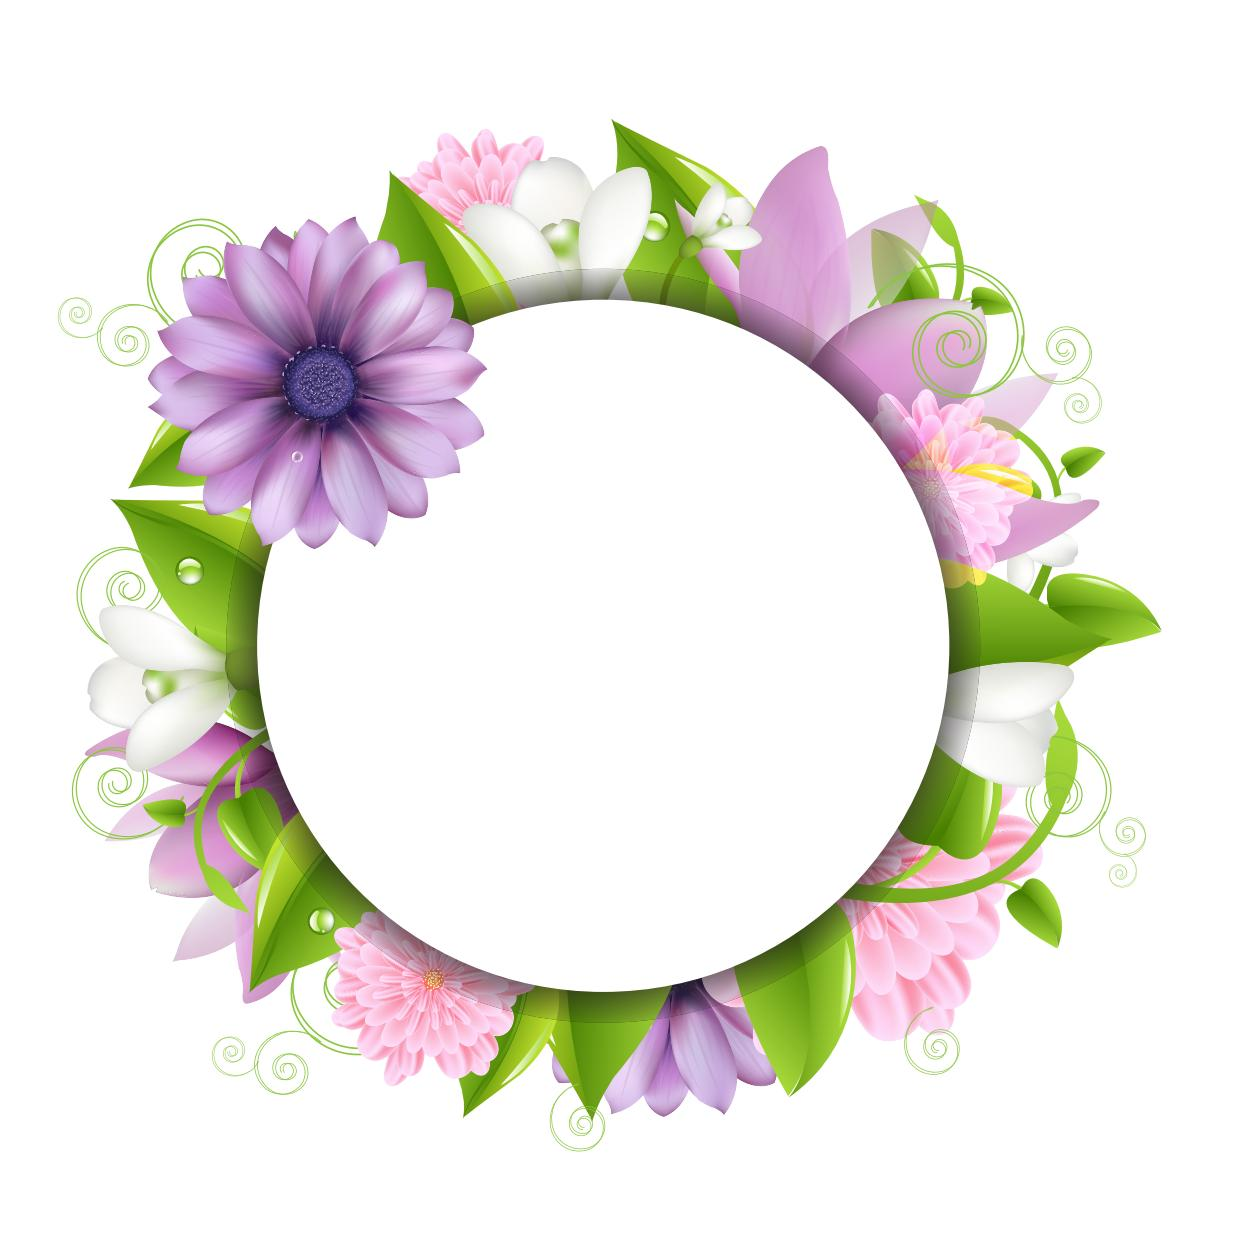 Background Frame Flower - ClipArt Best